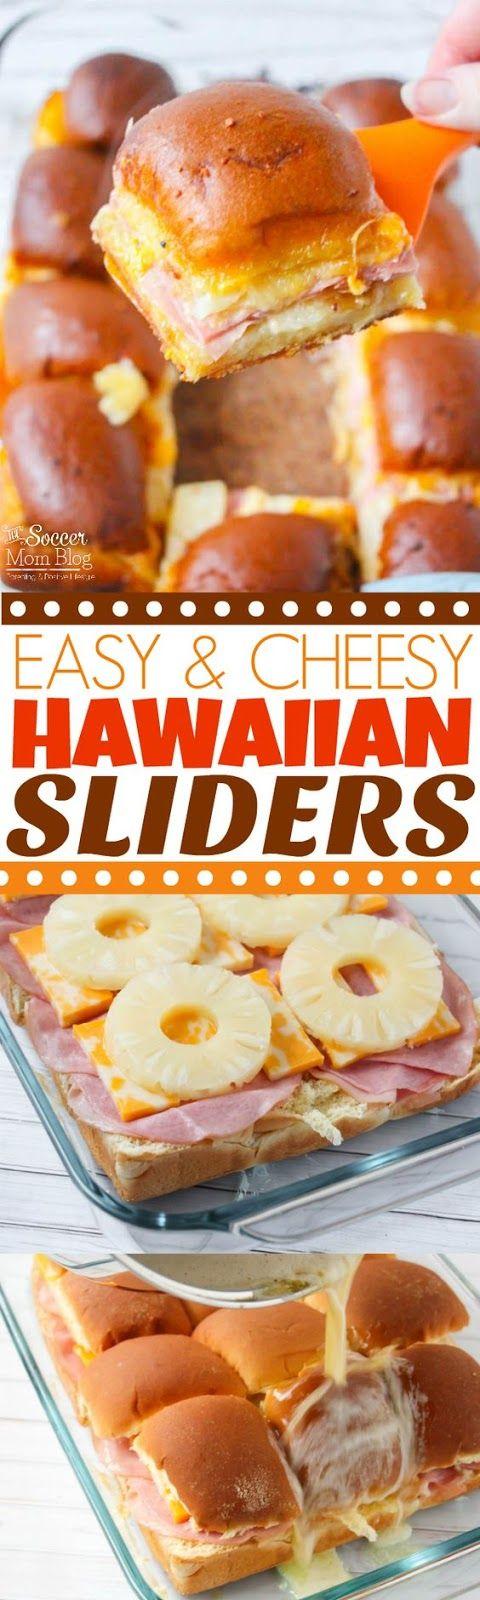 Hawaiian Sliders Recipe | Food And Cake Recipes